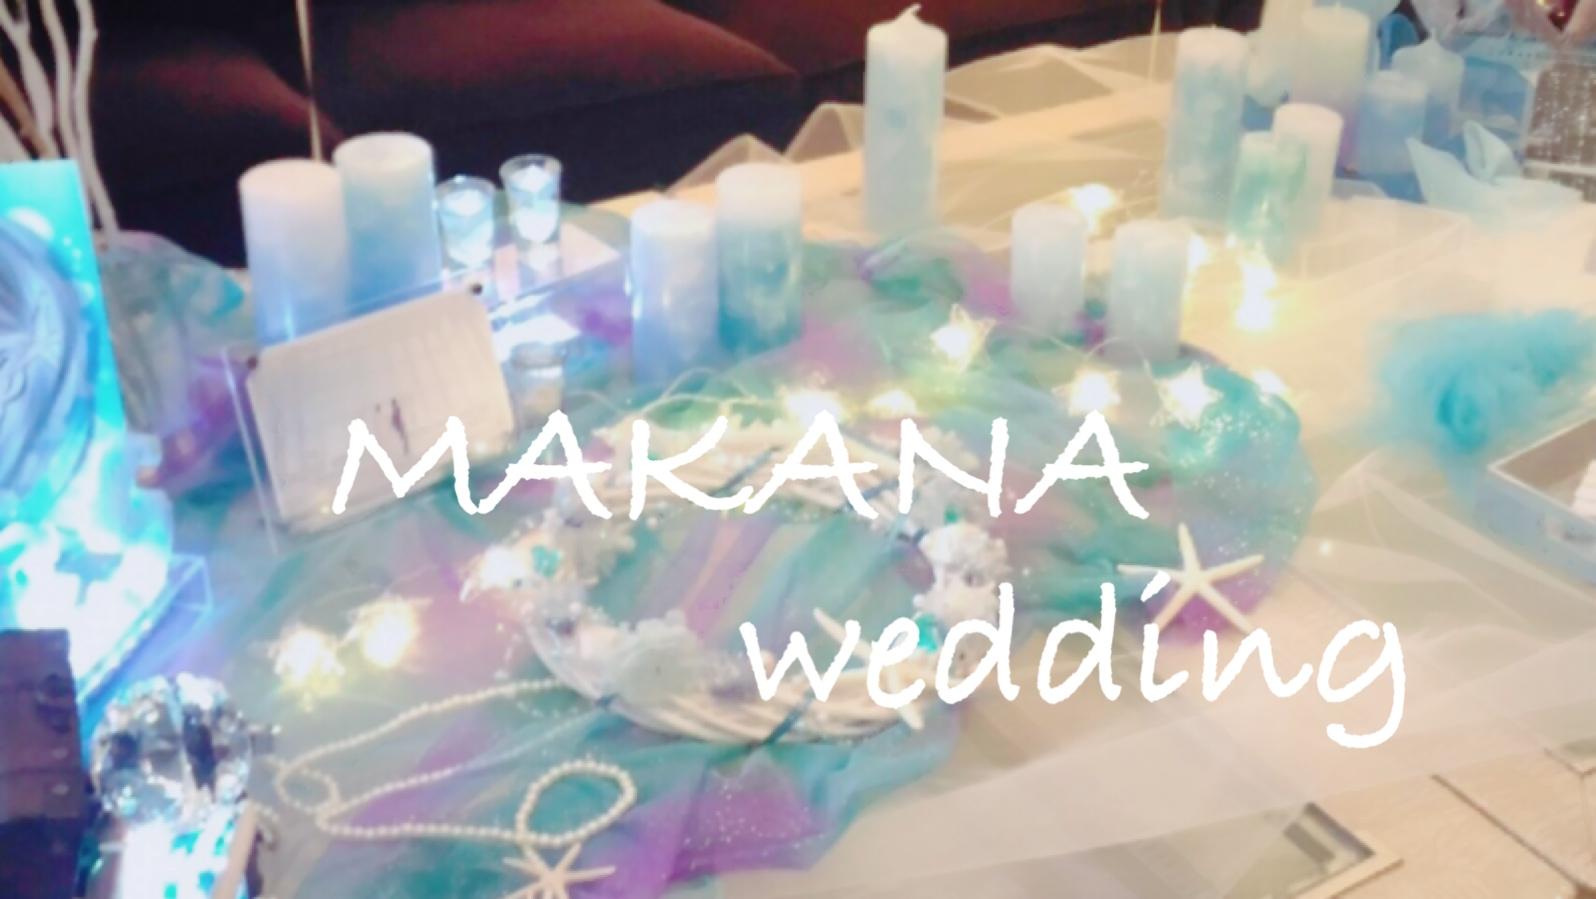 MAKANA wedding